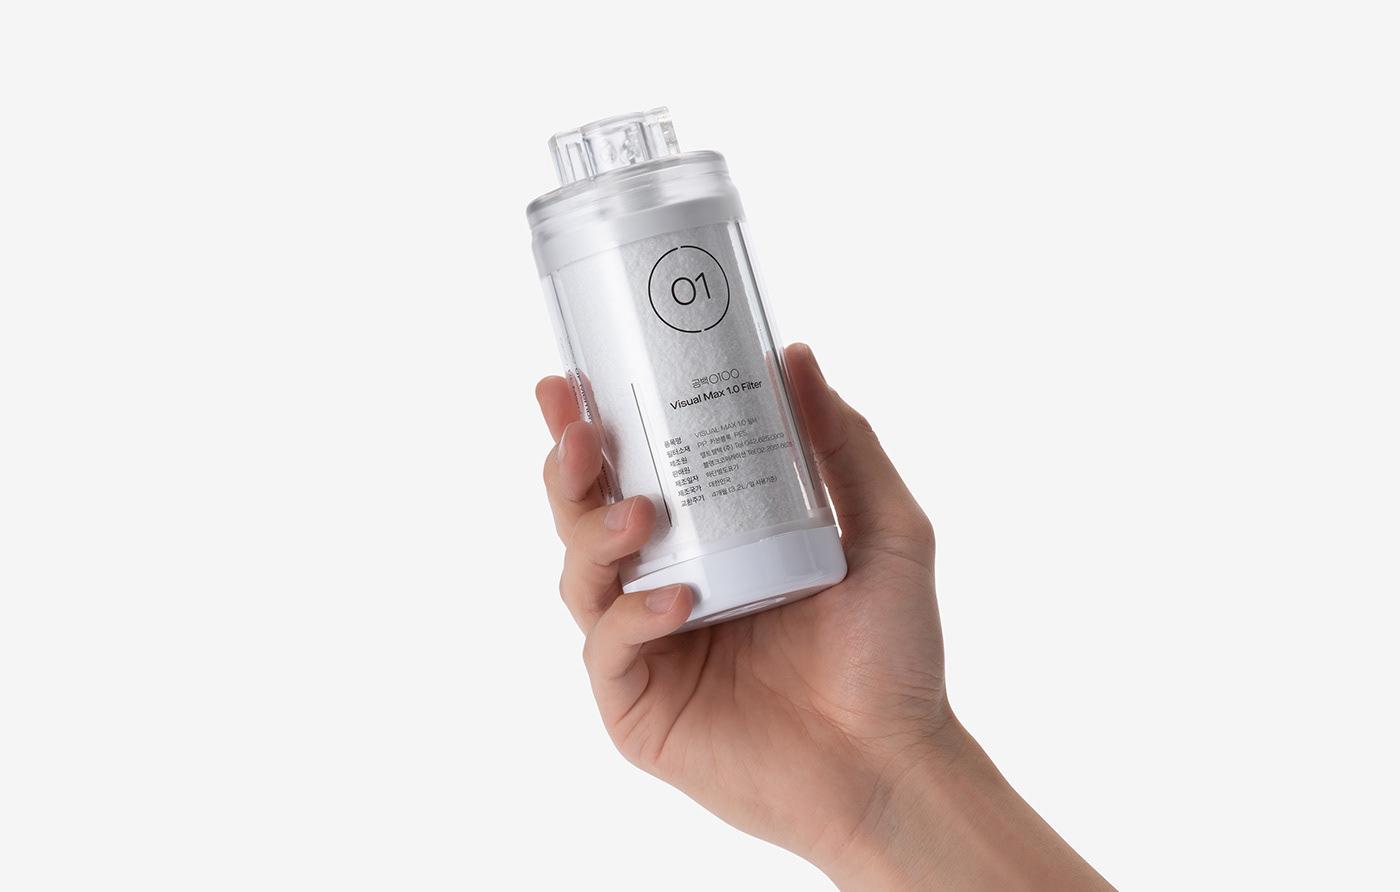 if design award water purifier industrial design  product design  photograph Design Inspiration 디자인 스튜디오 산업디자인 제품디자인 제품디자인 스튜디오